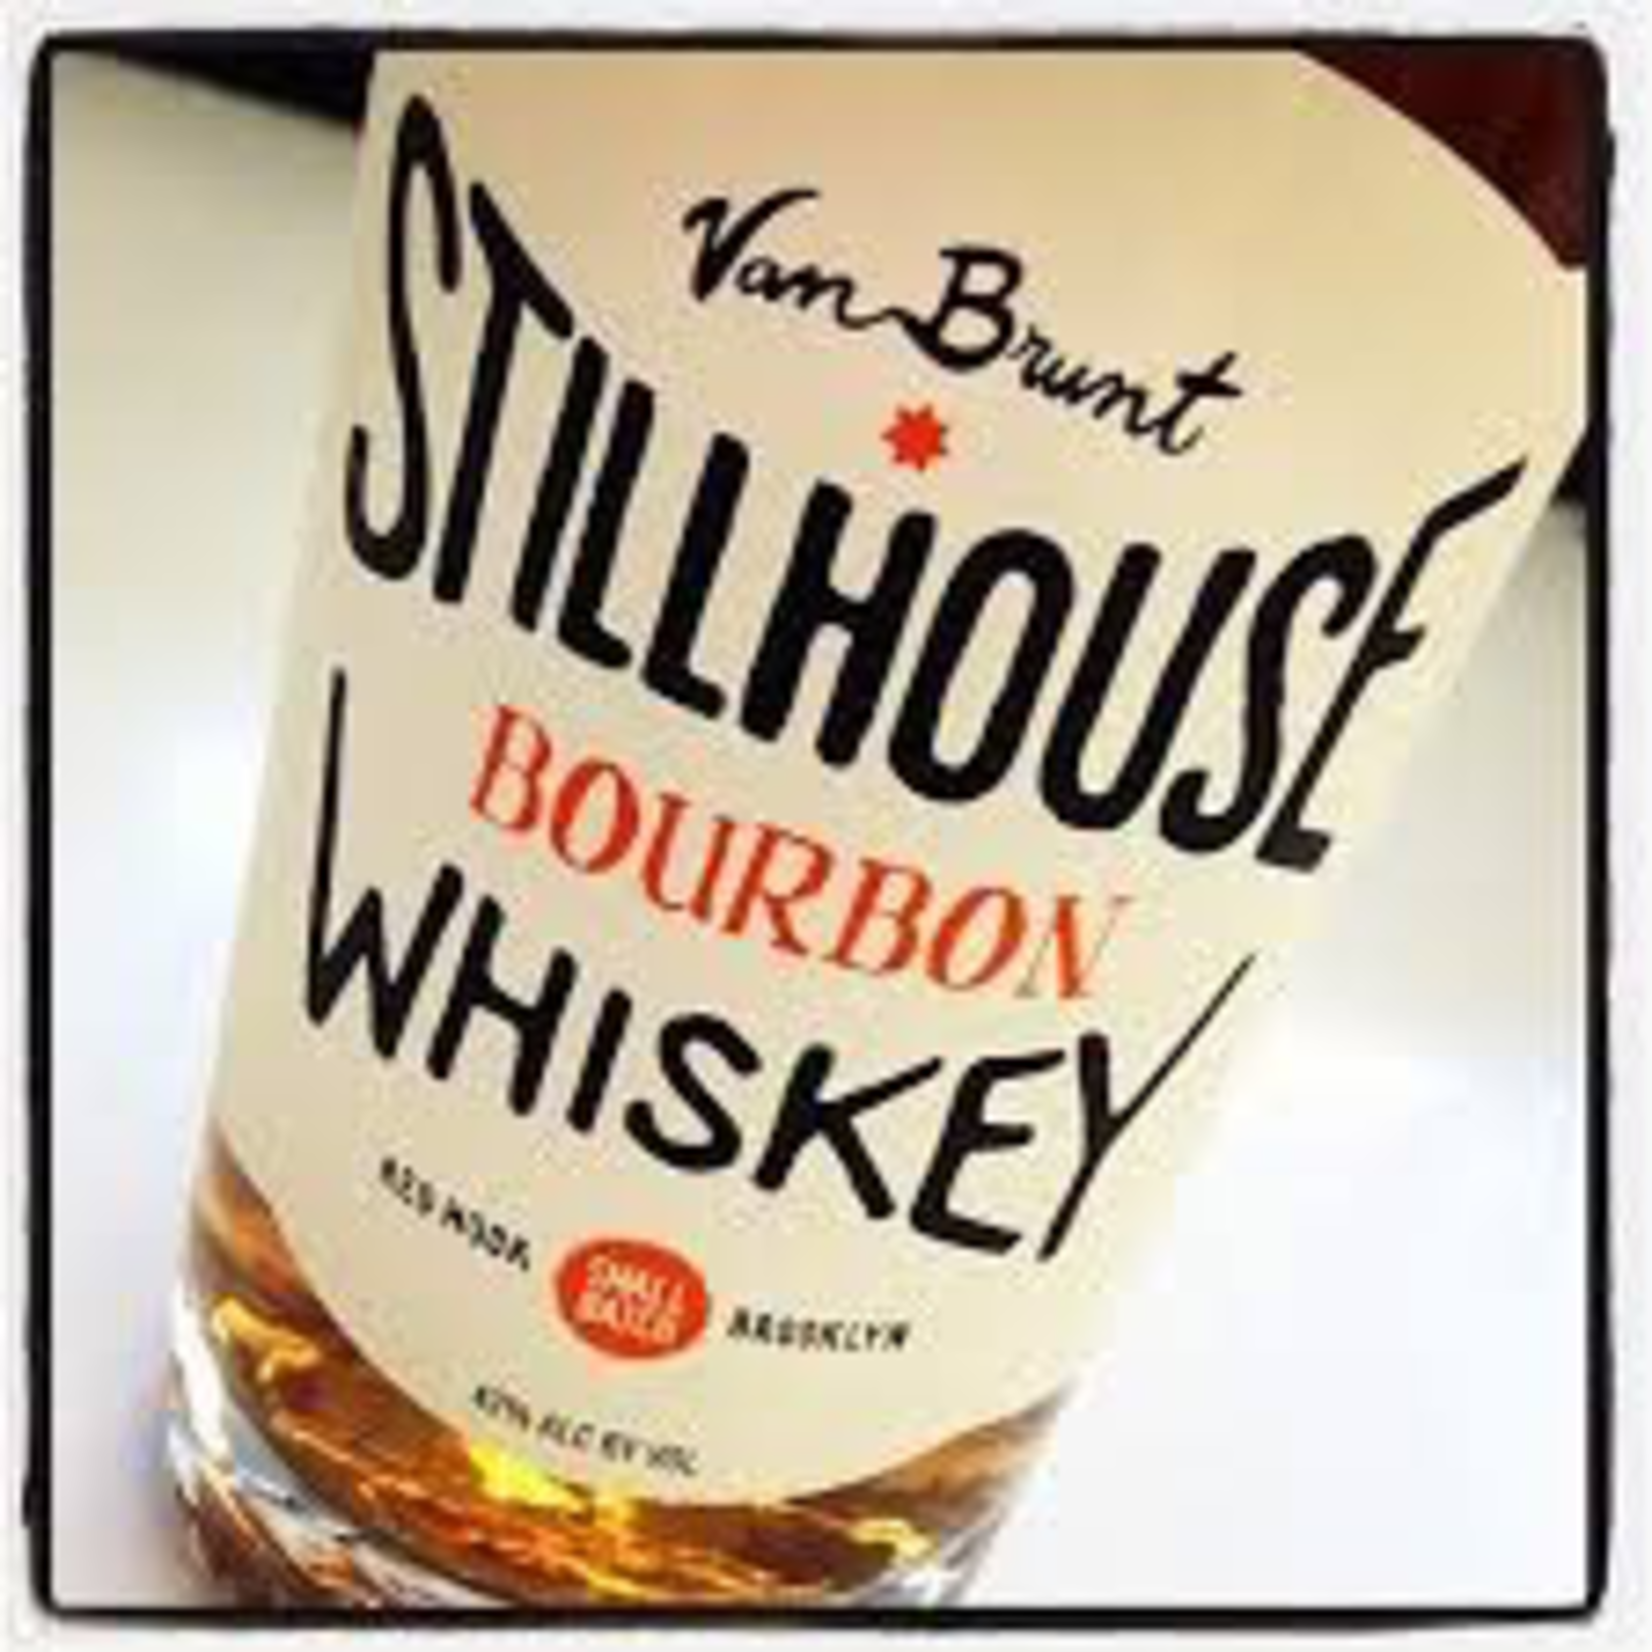 Spirits Van Brunt Stillhouse Bourbon Whiskey 375ml